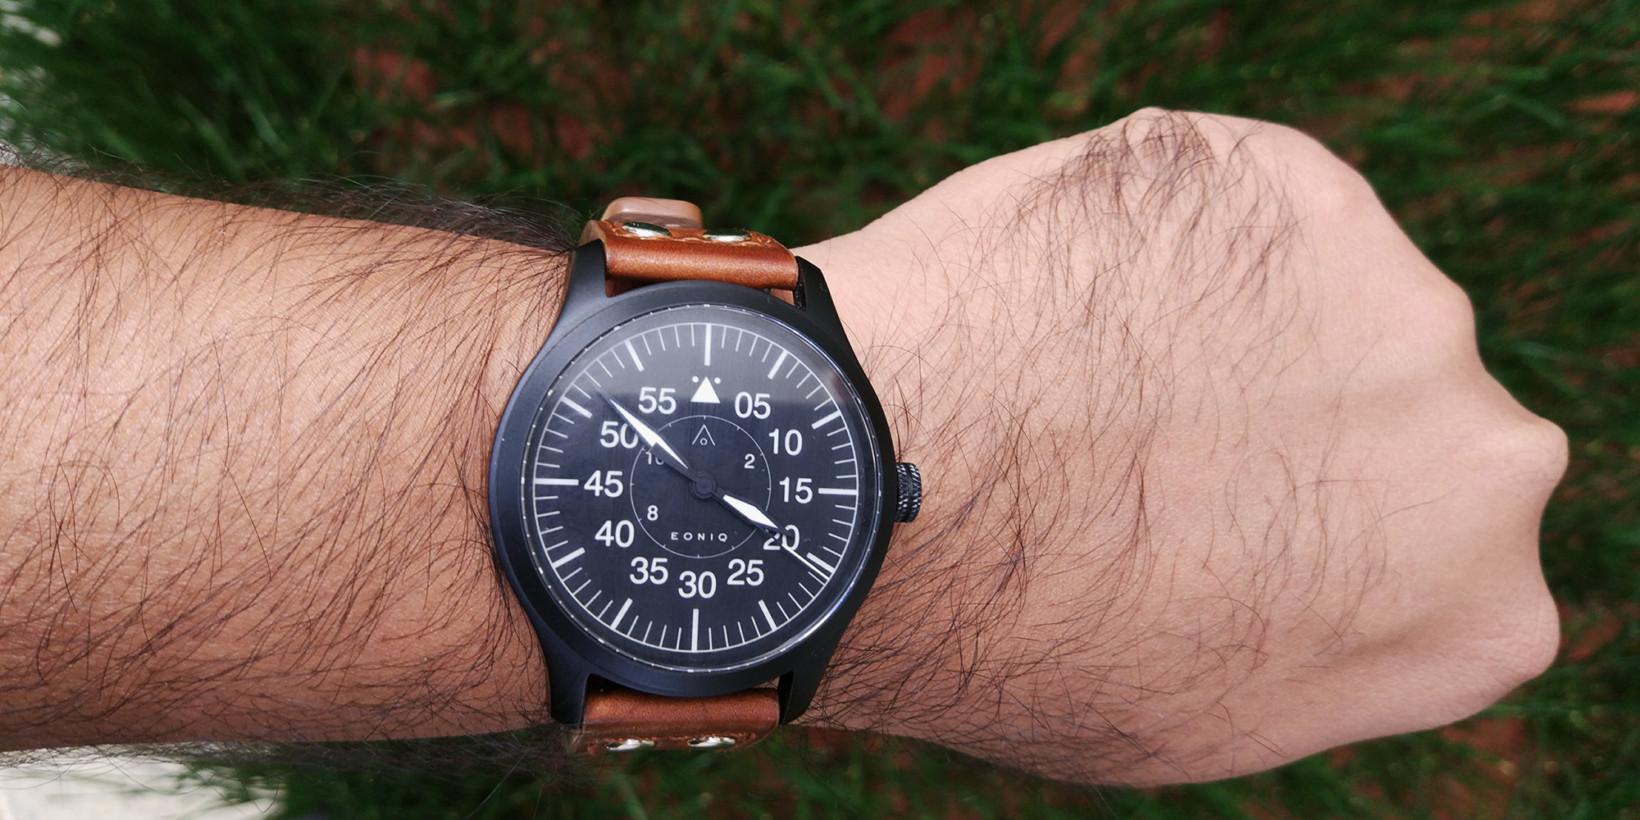 Eoniq wants to change the way you buy watches